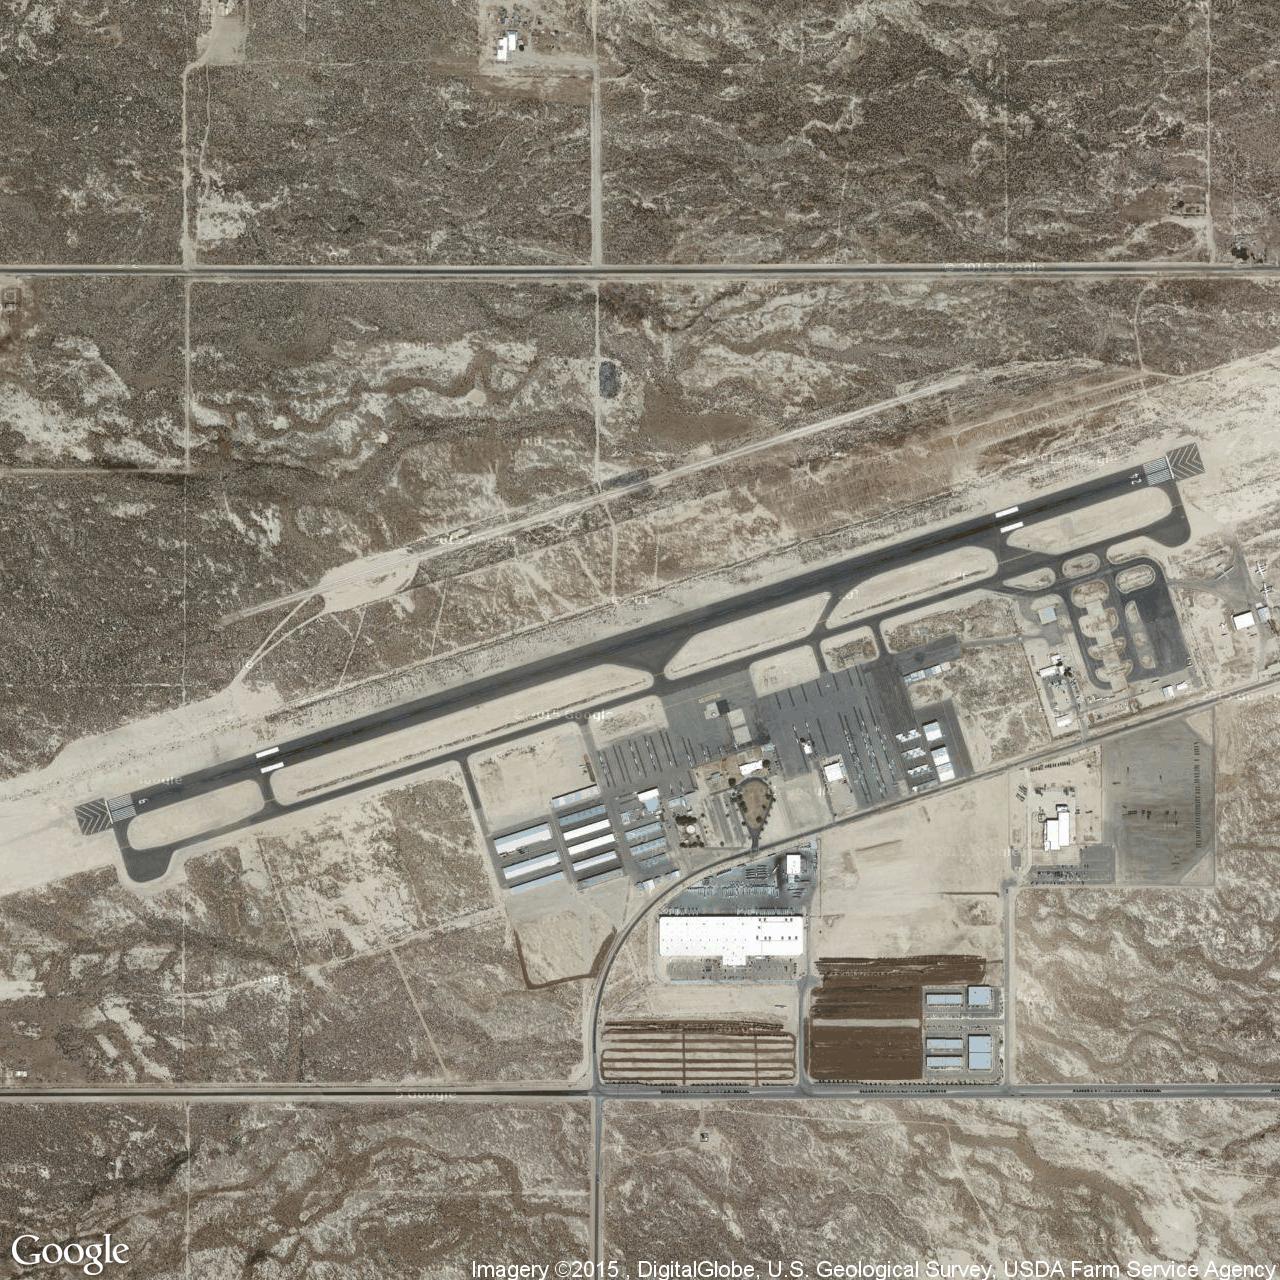 General Wm J Fox Airfield